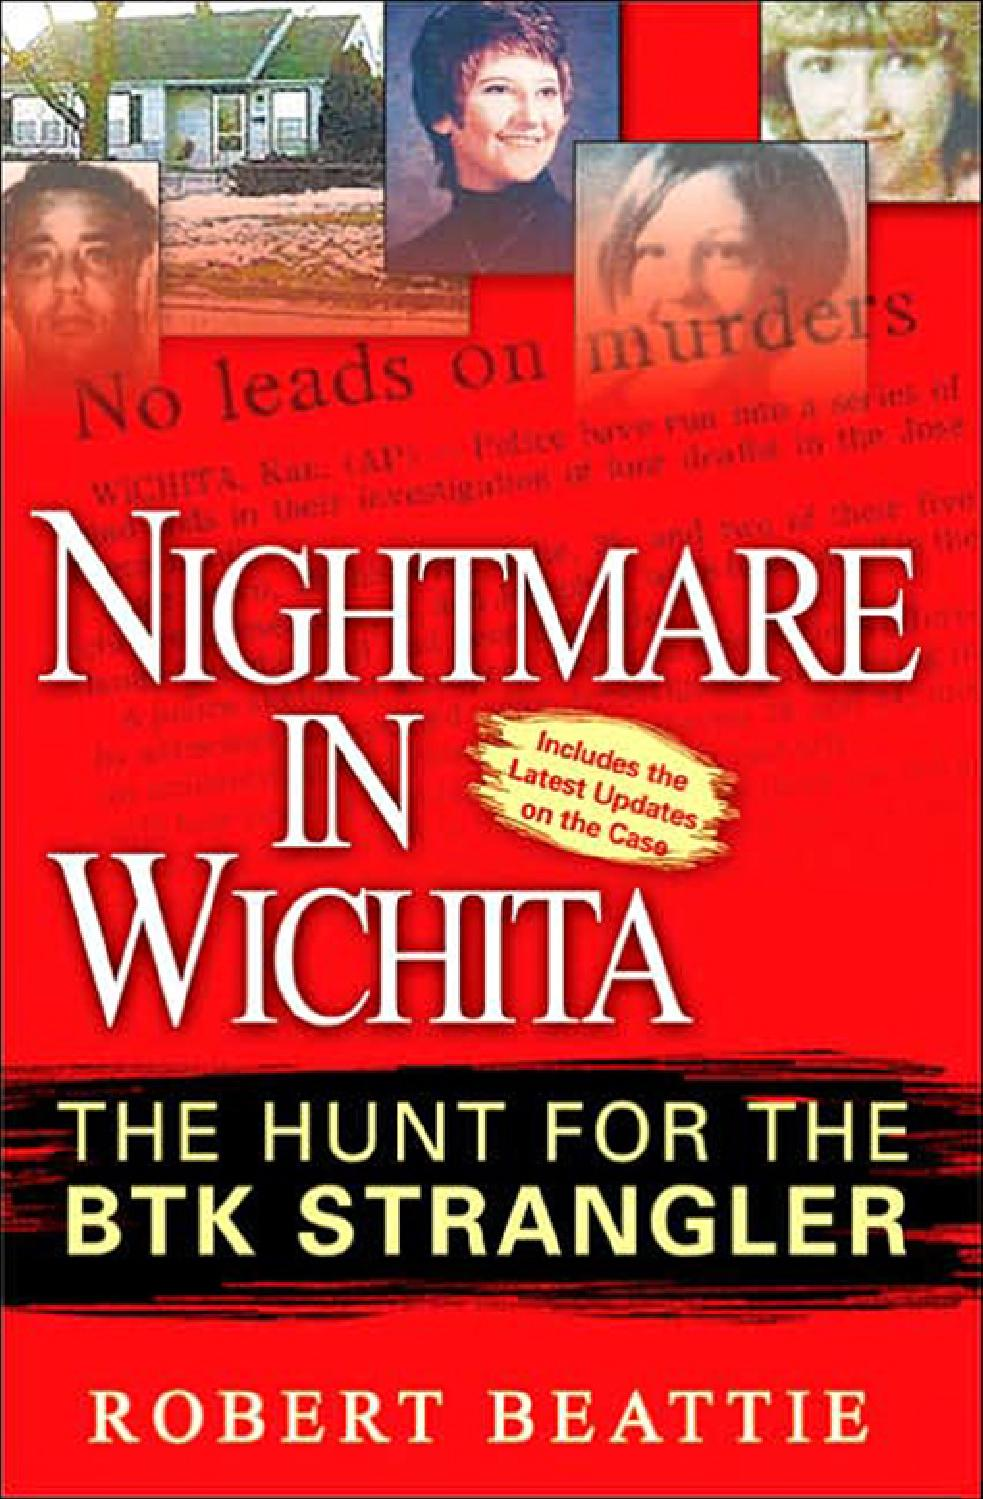 Robert beattie nightmare in wichita the hunt for the btk strangler